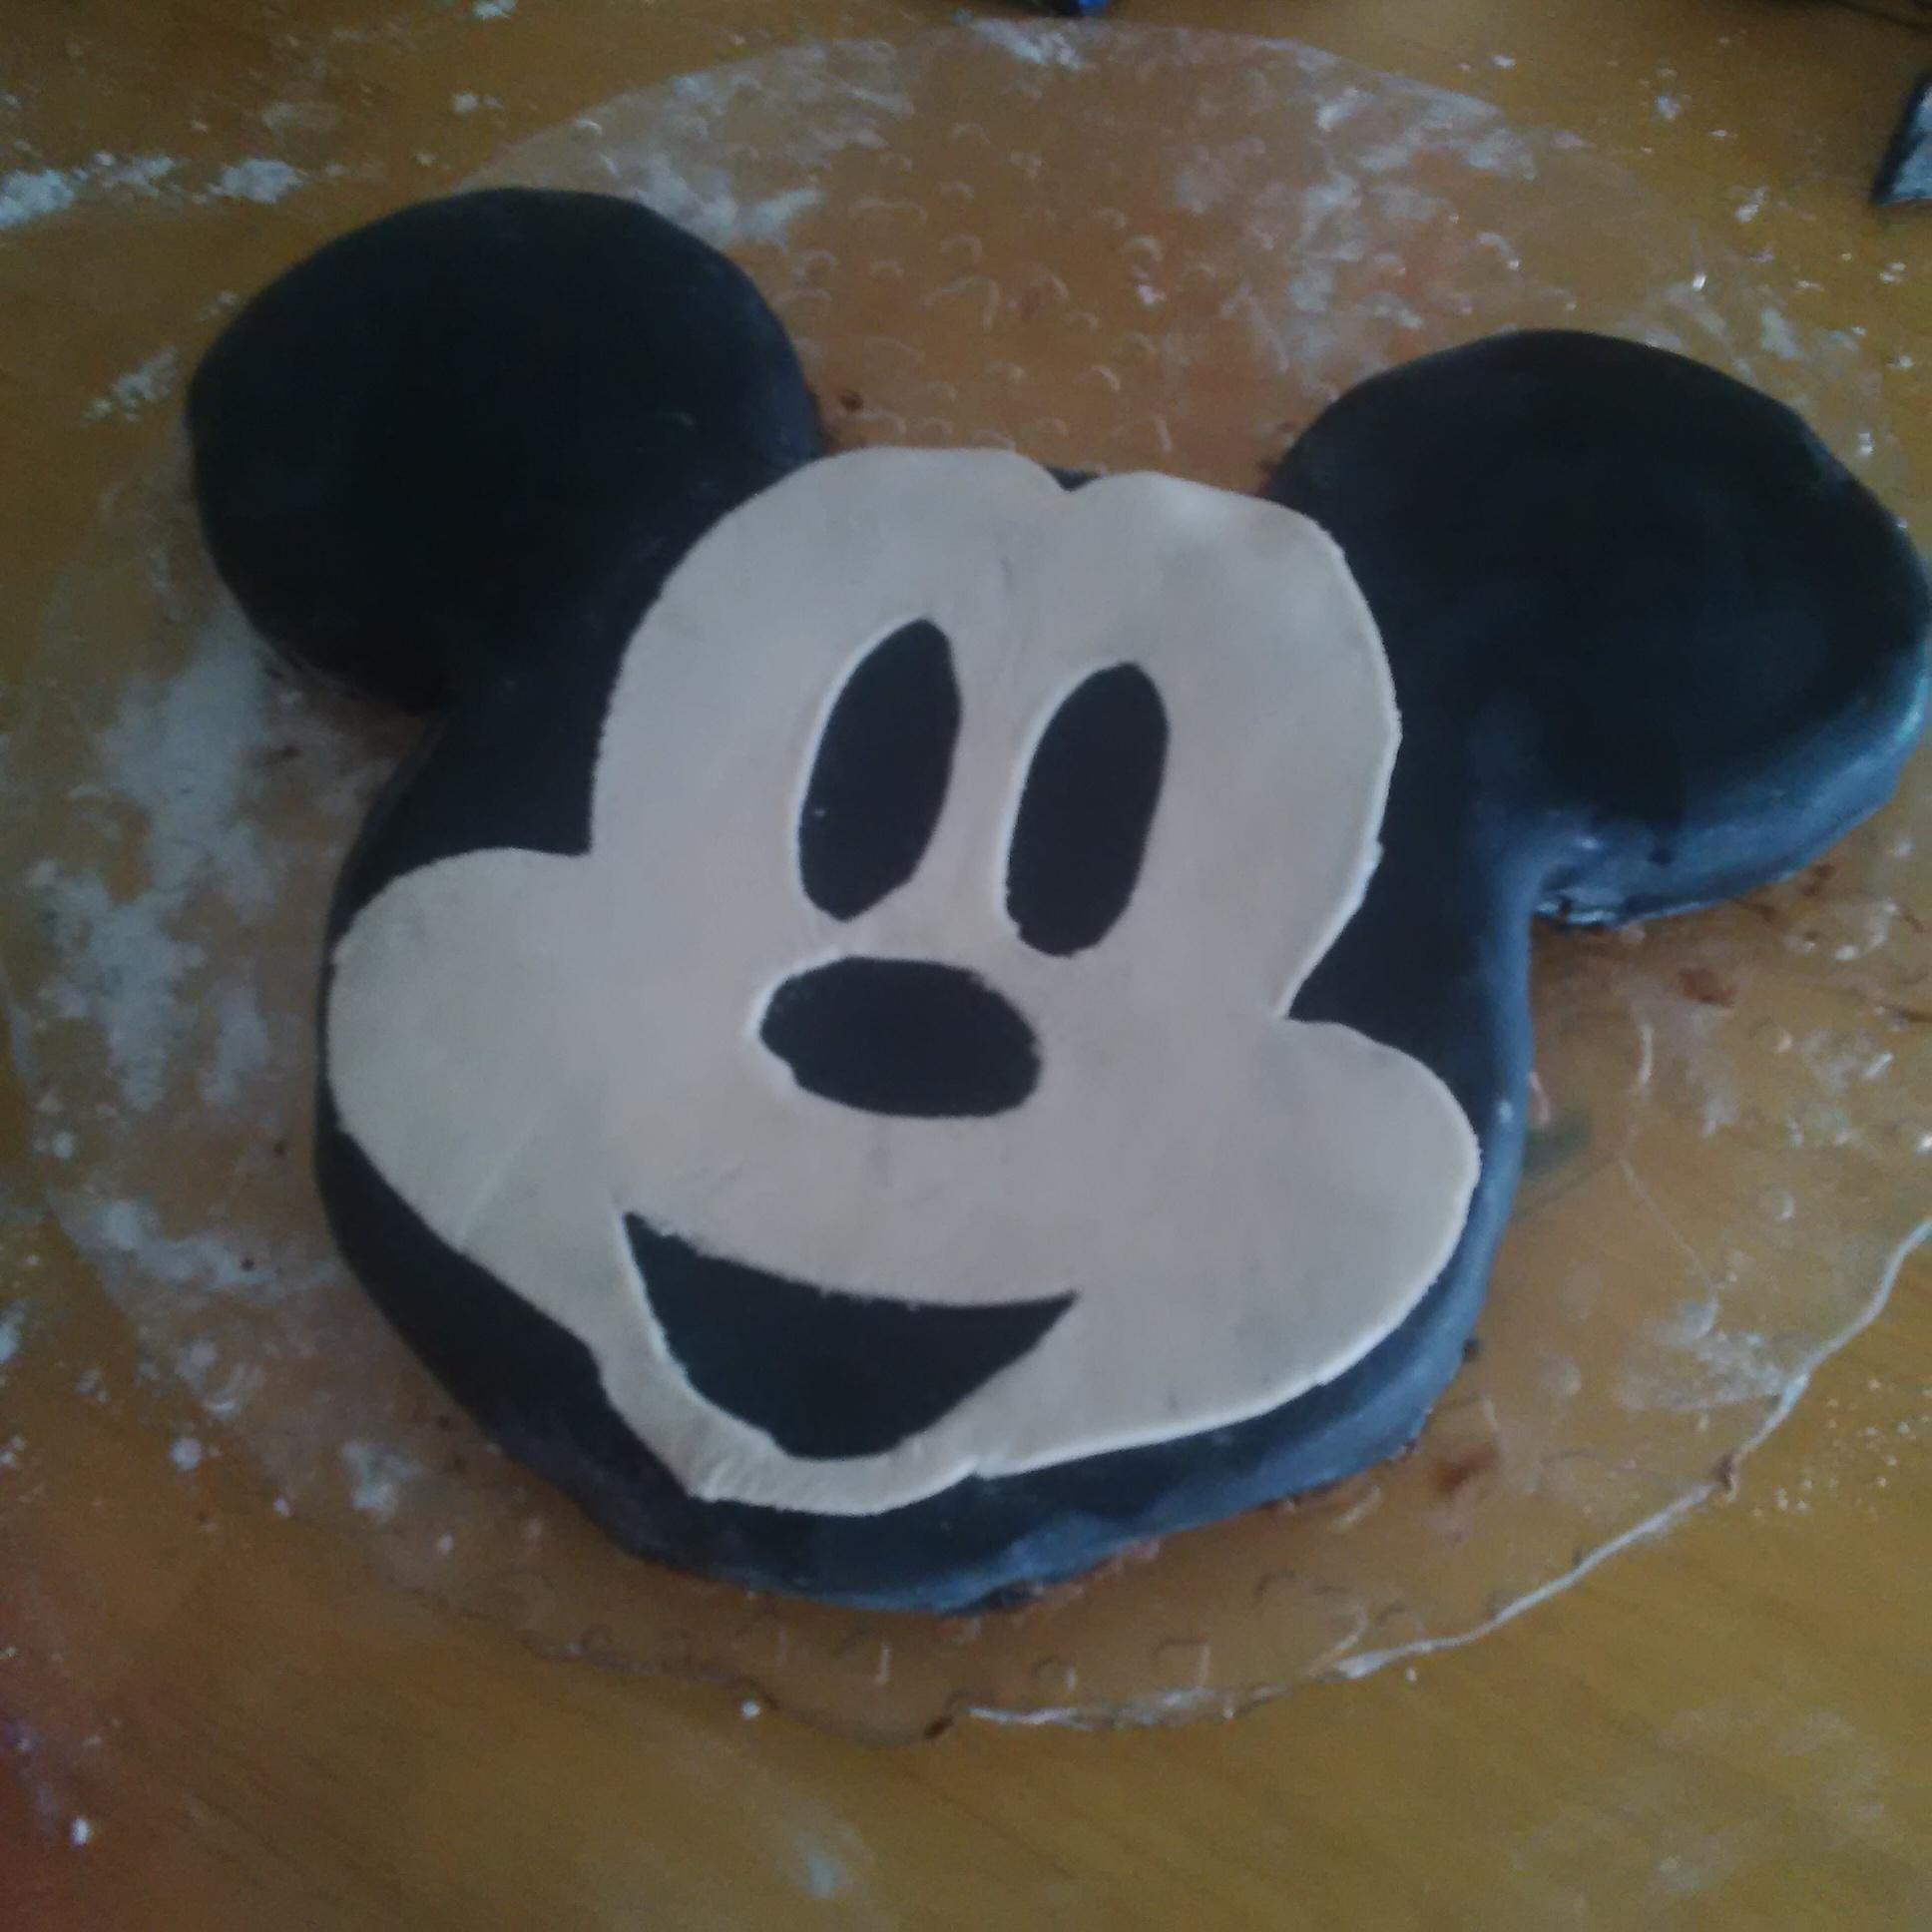 Bekannt Tuto DIY: Le Gâteau Mickey! - Allo Maman Dodo KK47